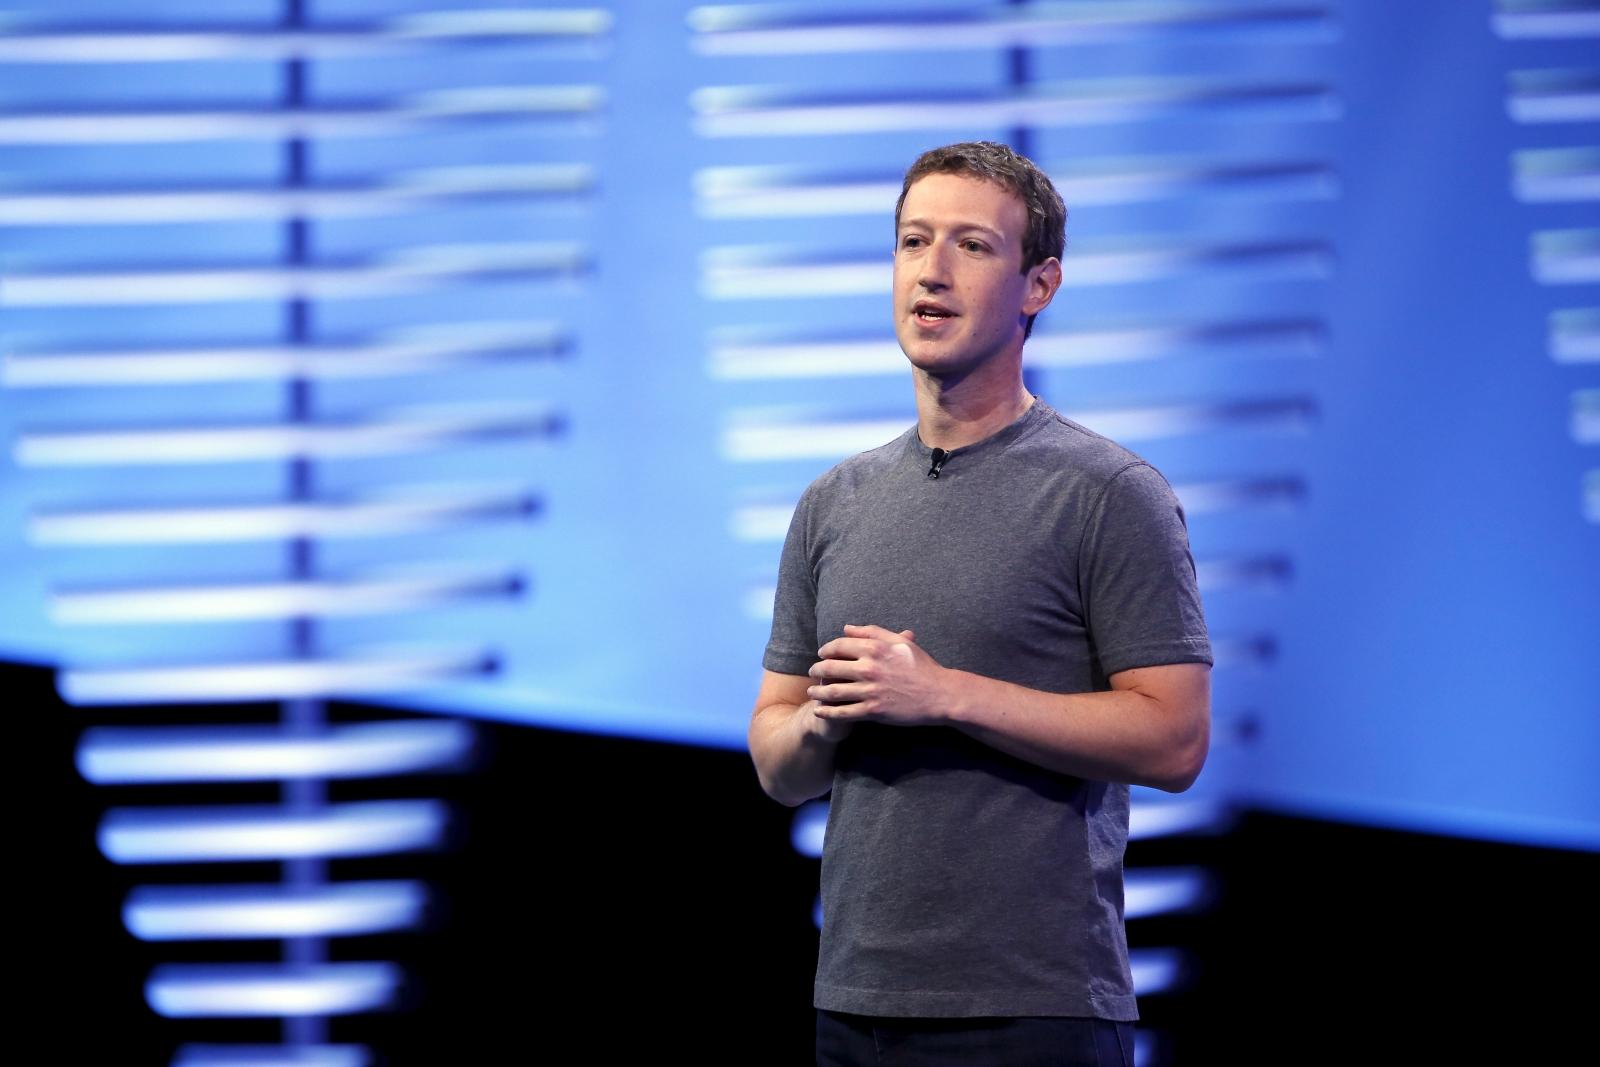 Facebook accidentally deletes Mark Zuckerberg's posts on fake news controversy